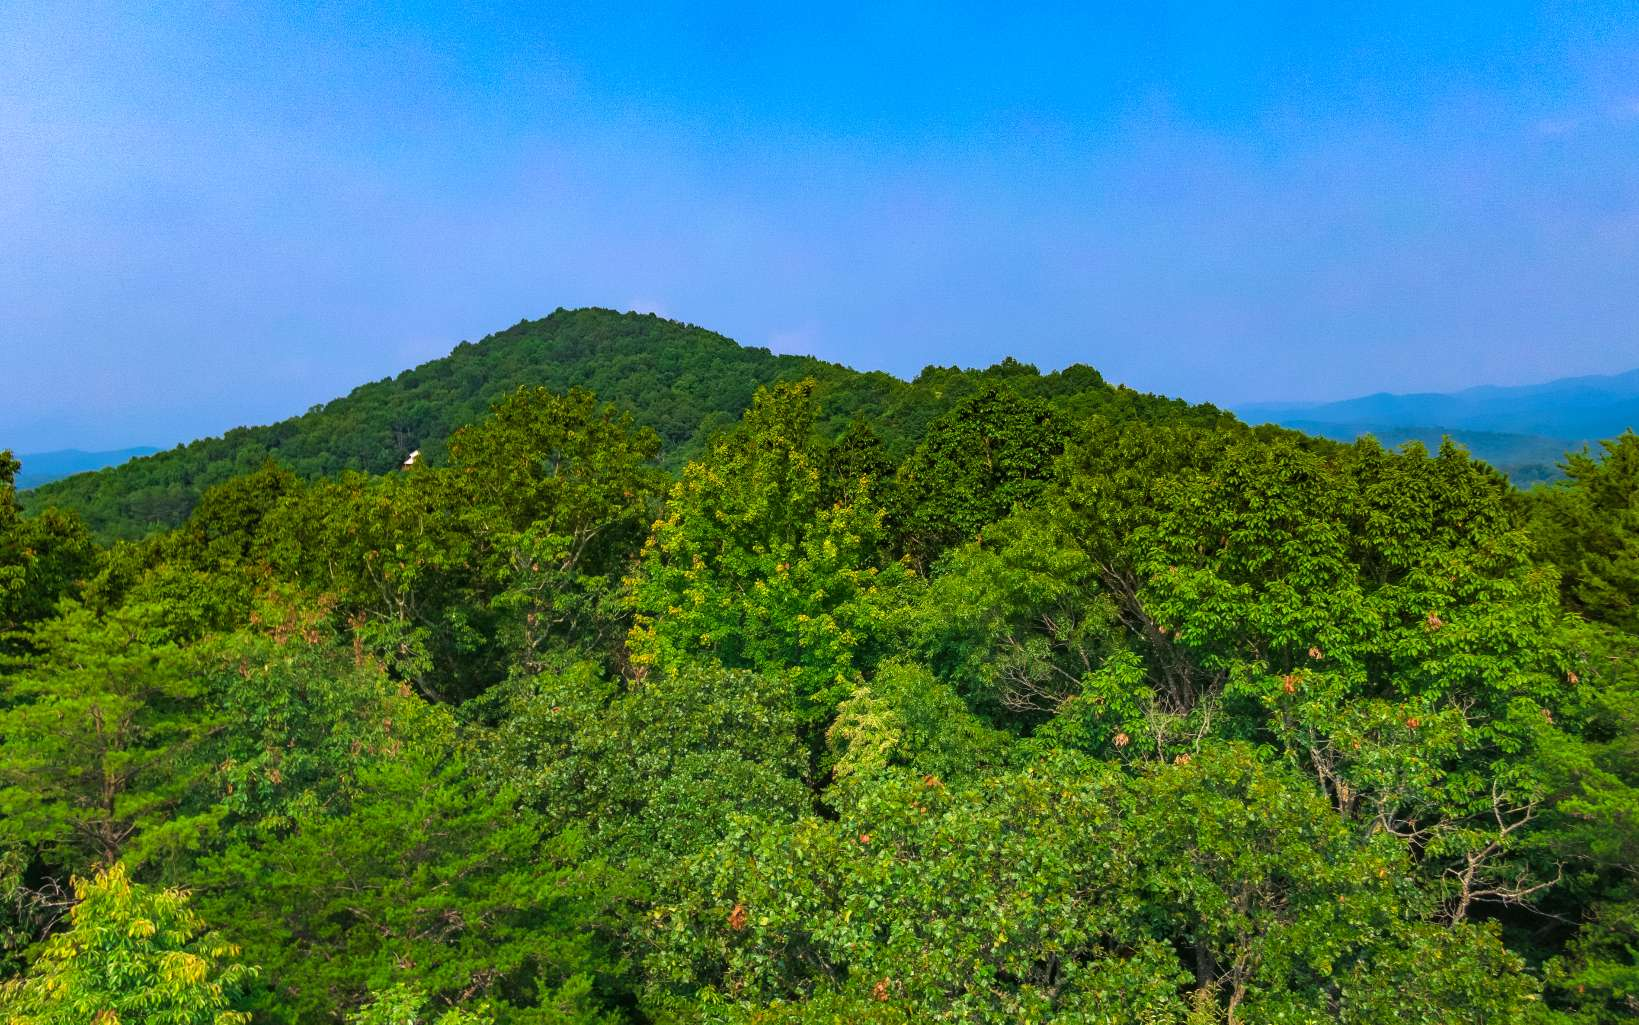 SHINBONE MOUNTAIN